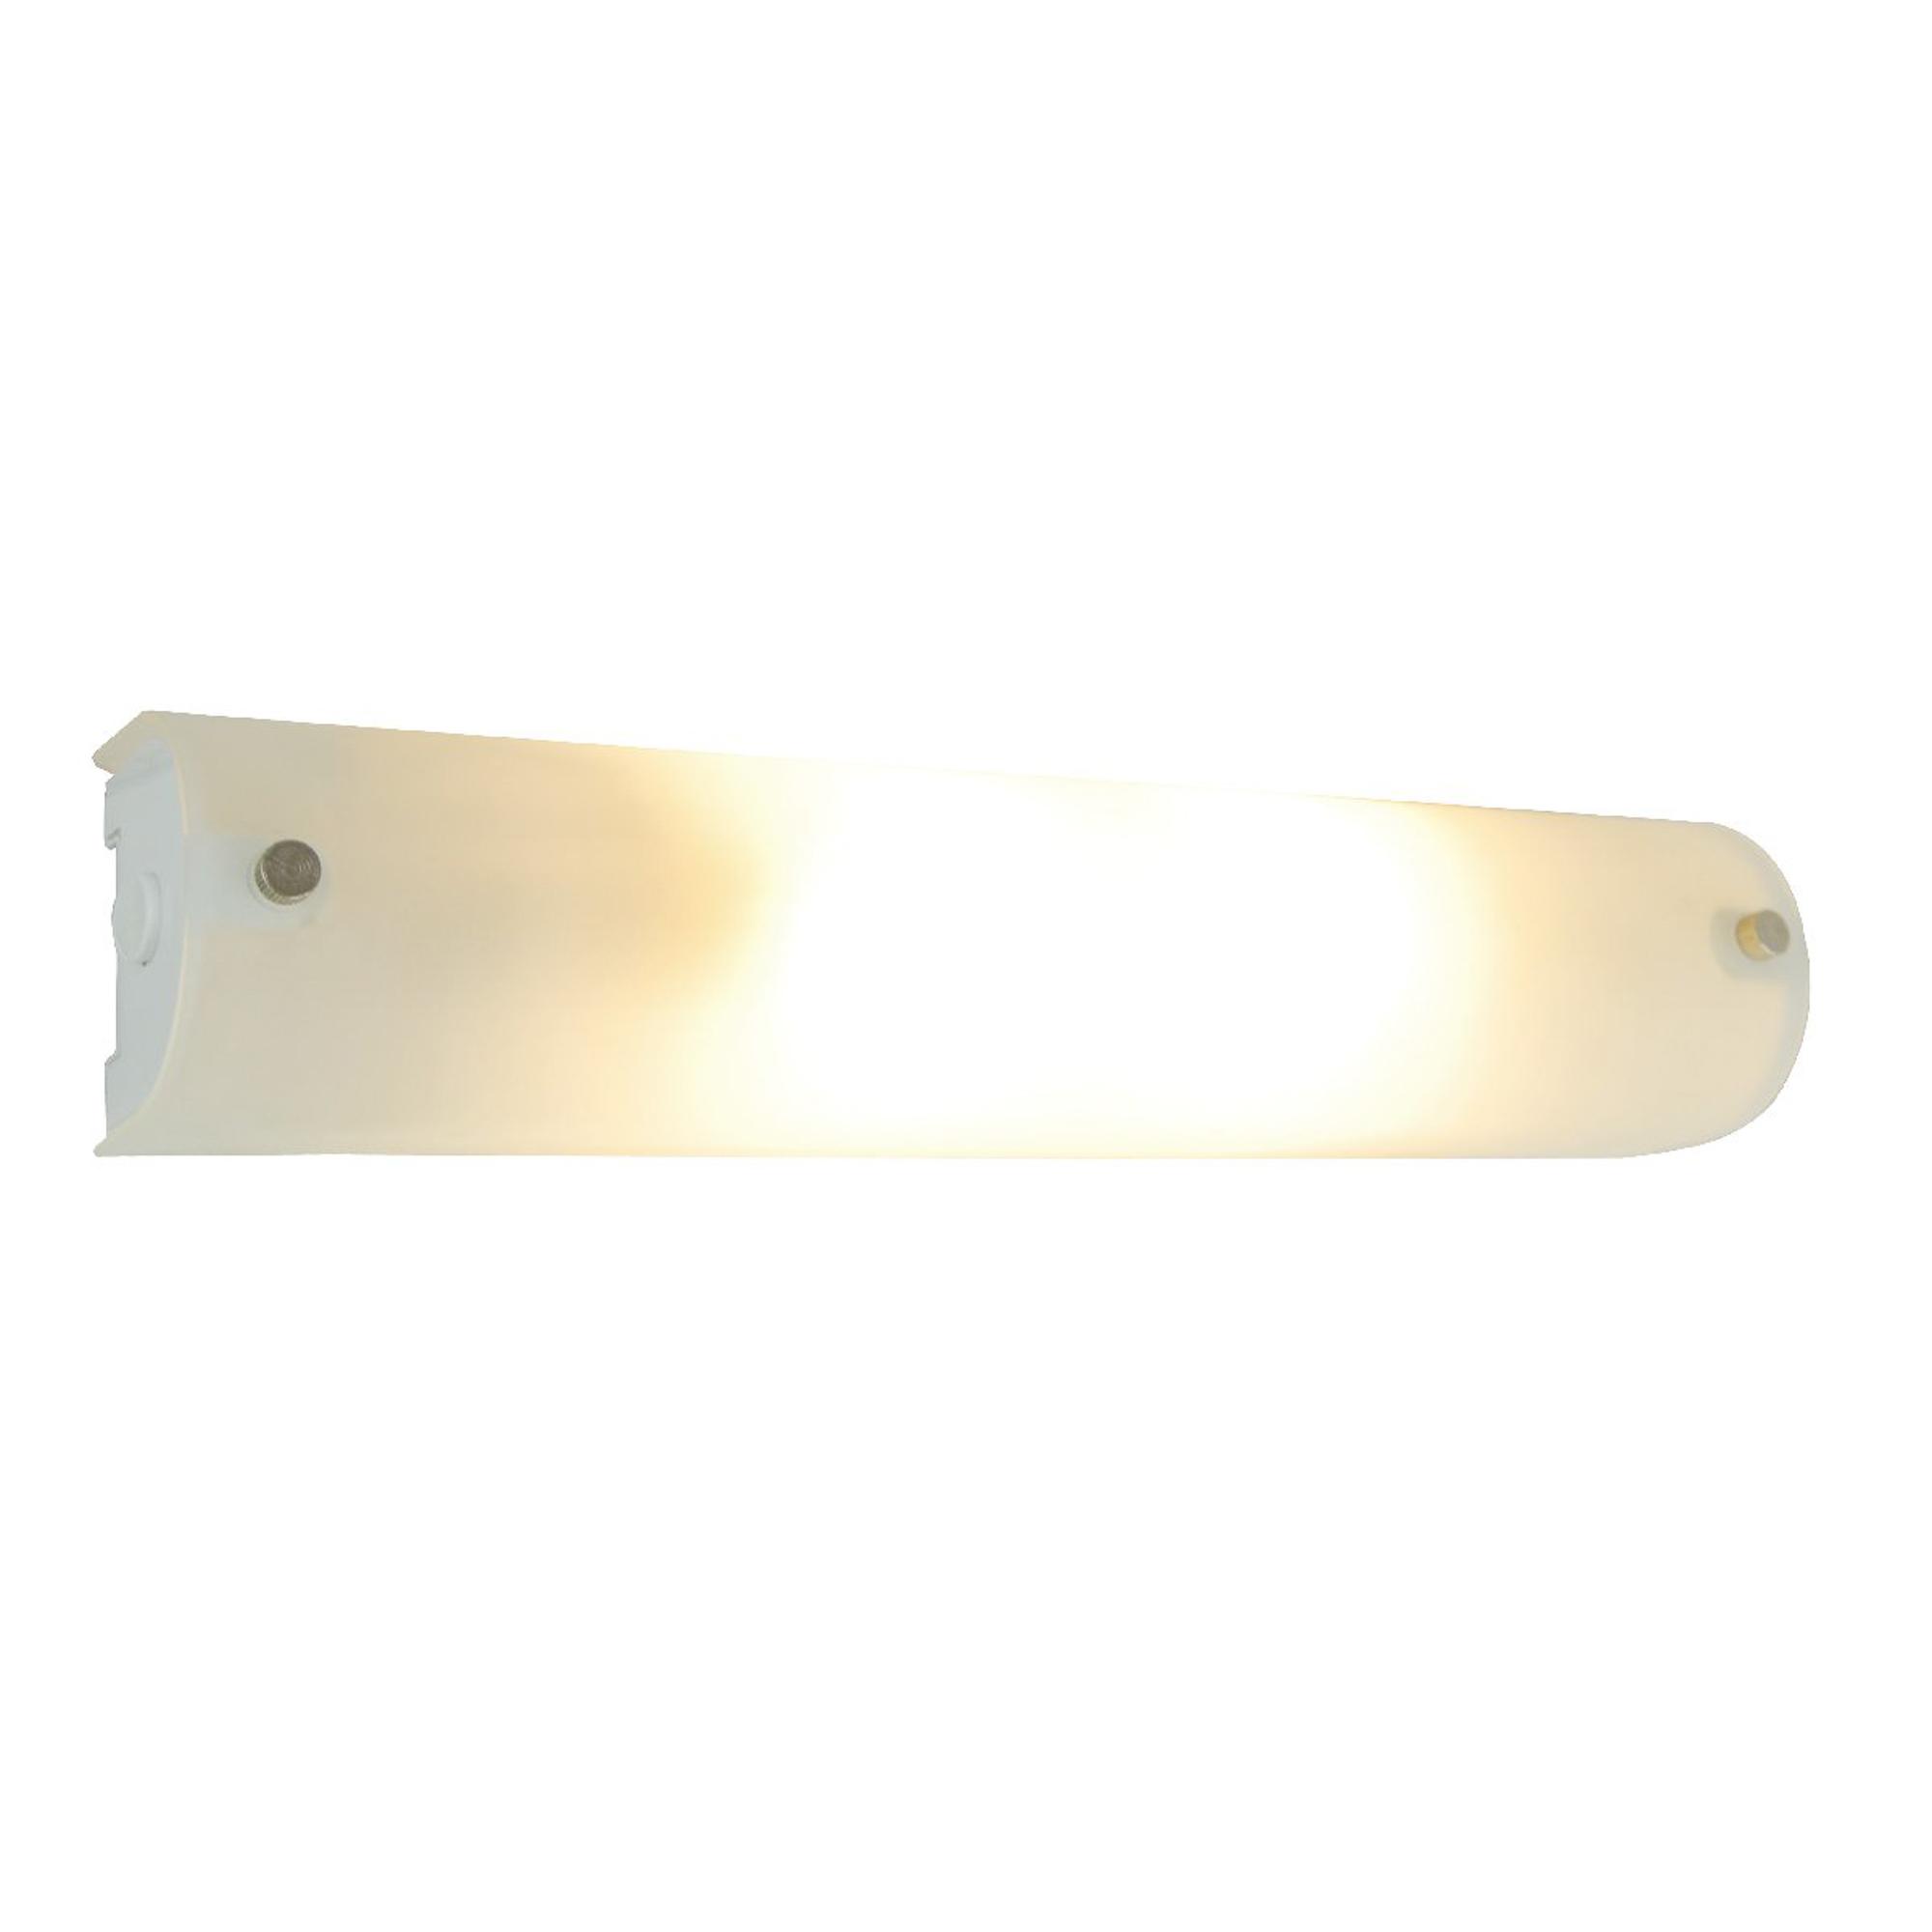 Фото - Подсветка для картин Arte Lamp TRATTO A4101AP-2WH светильник arte lamp для зеркал tratto a4101ap 3wh